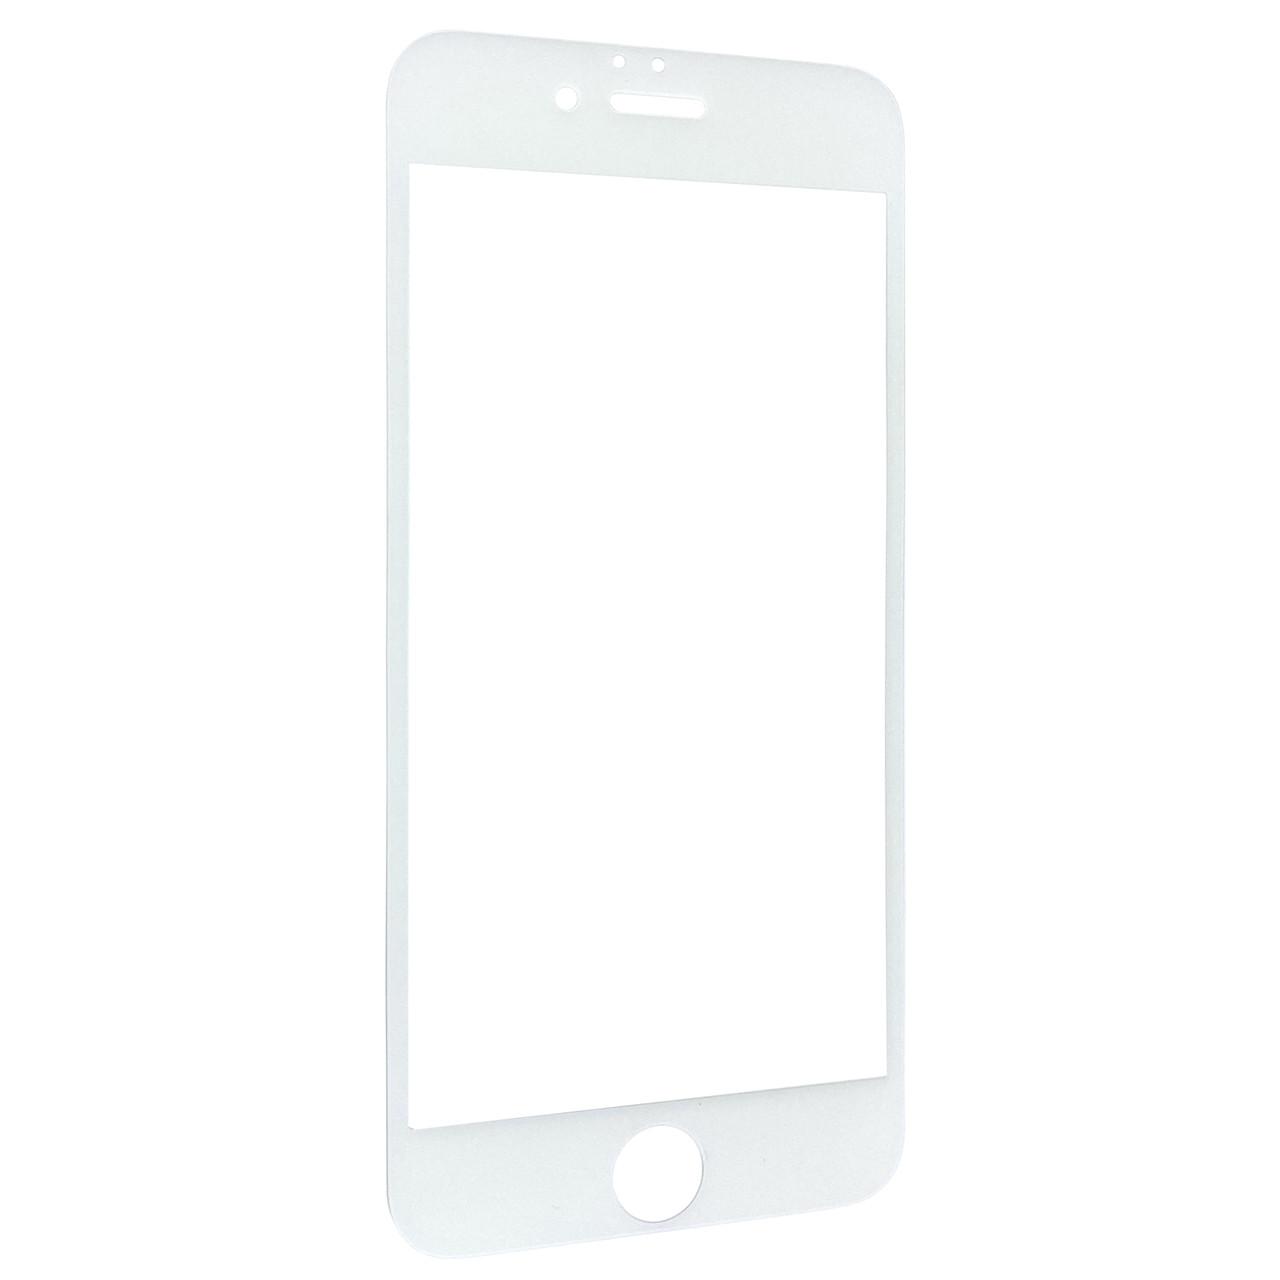 Защитное стекло  весь экран matt 2D for Apple iPhone 6/6S front (white)